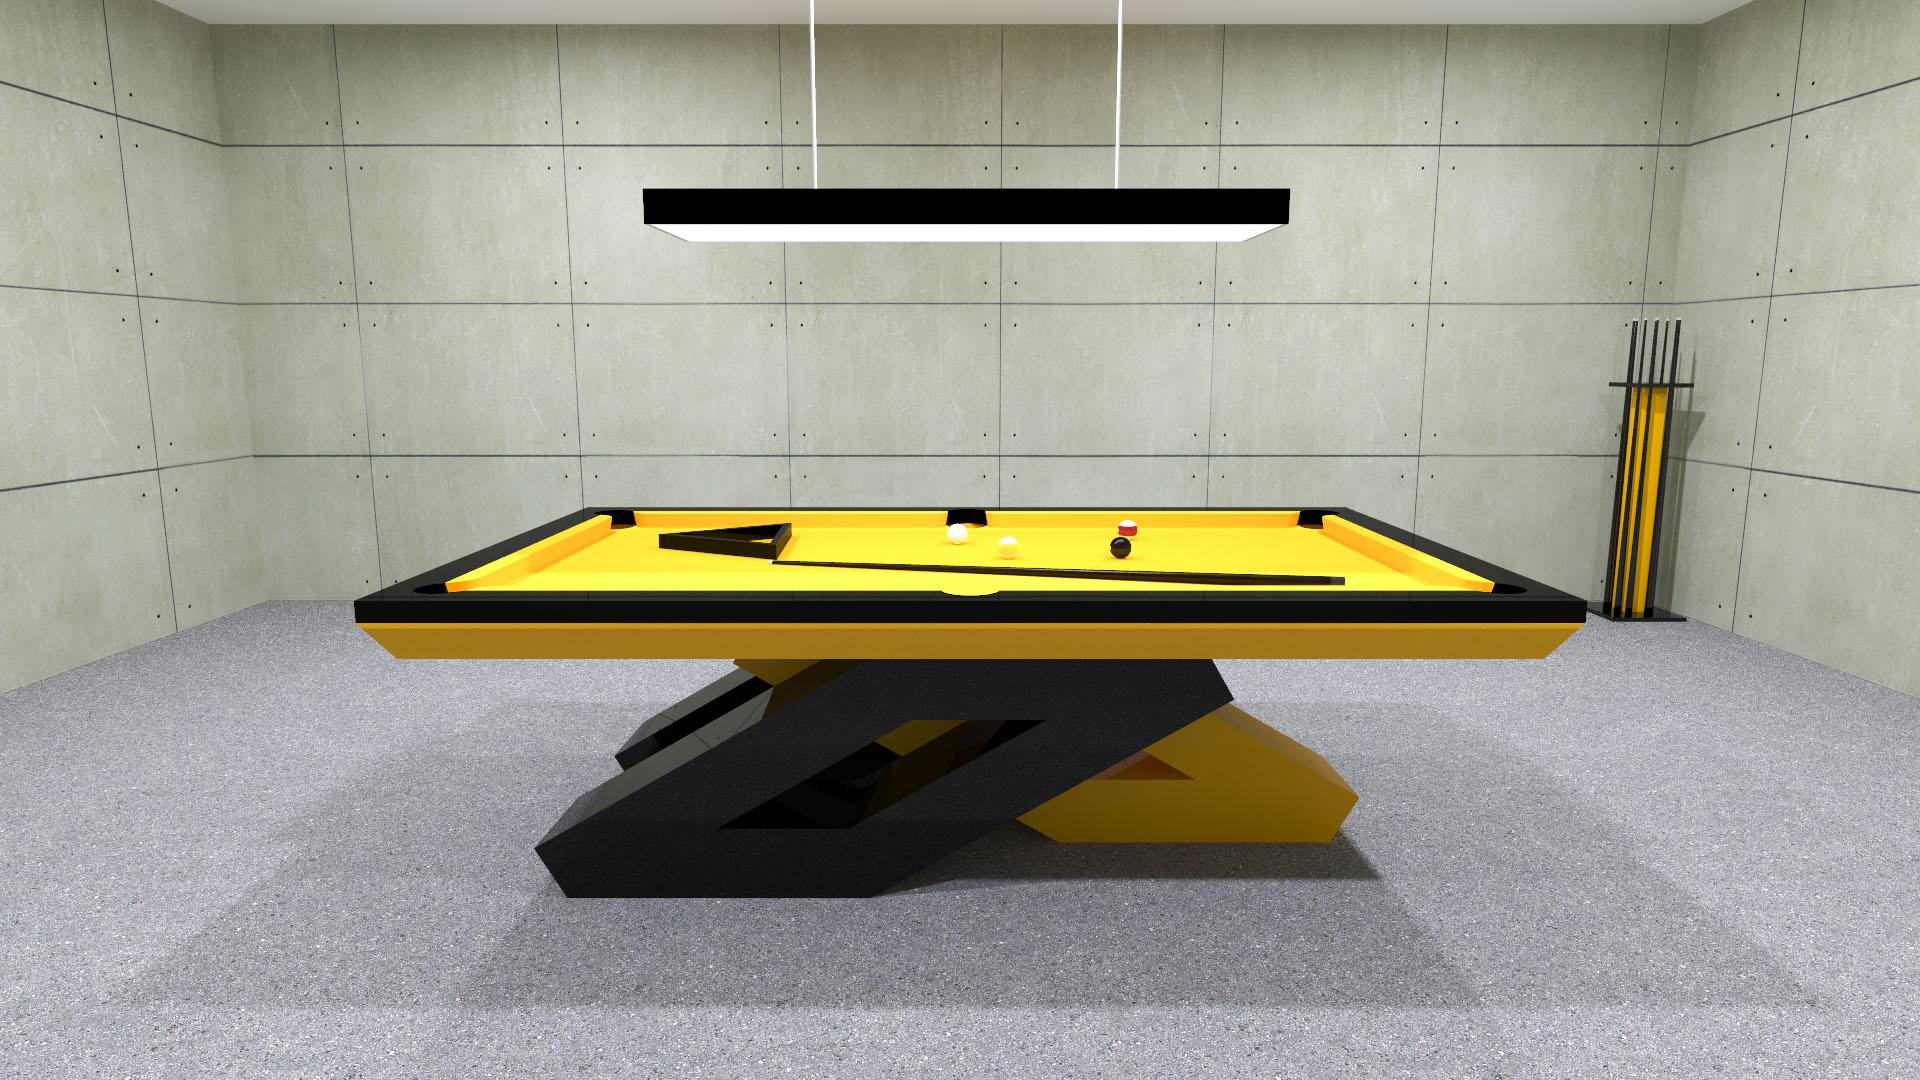 Dozer amarelo frente.jpg